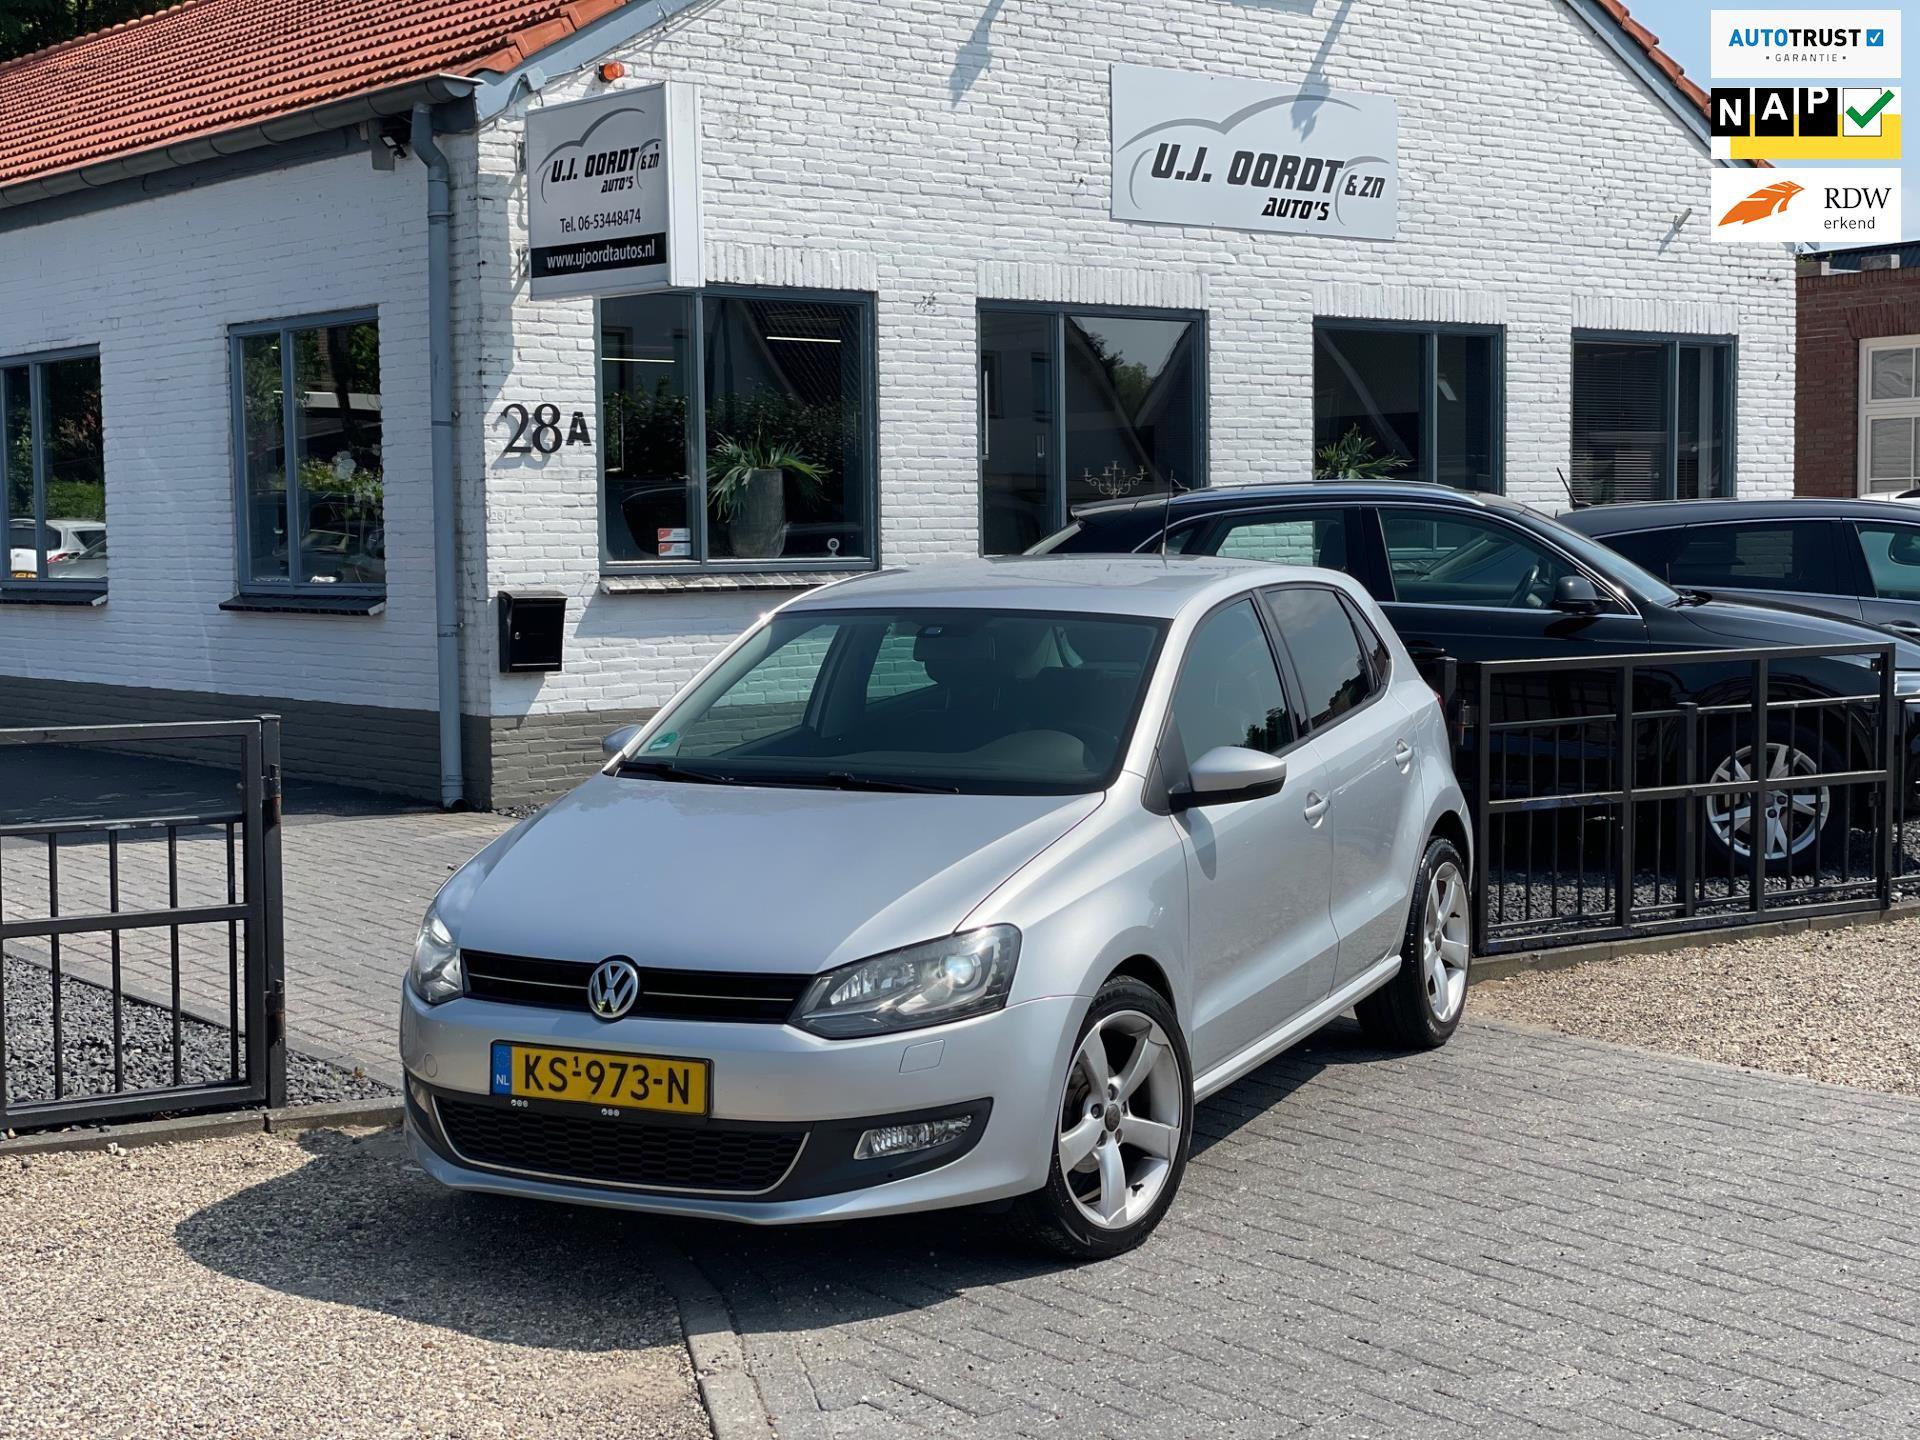 Volkswagen Polo occasion - U.J. Oordt Auto's